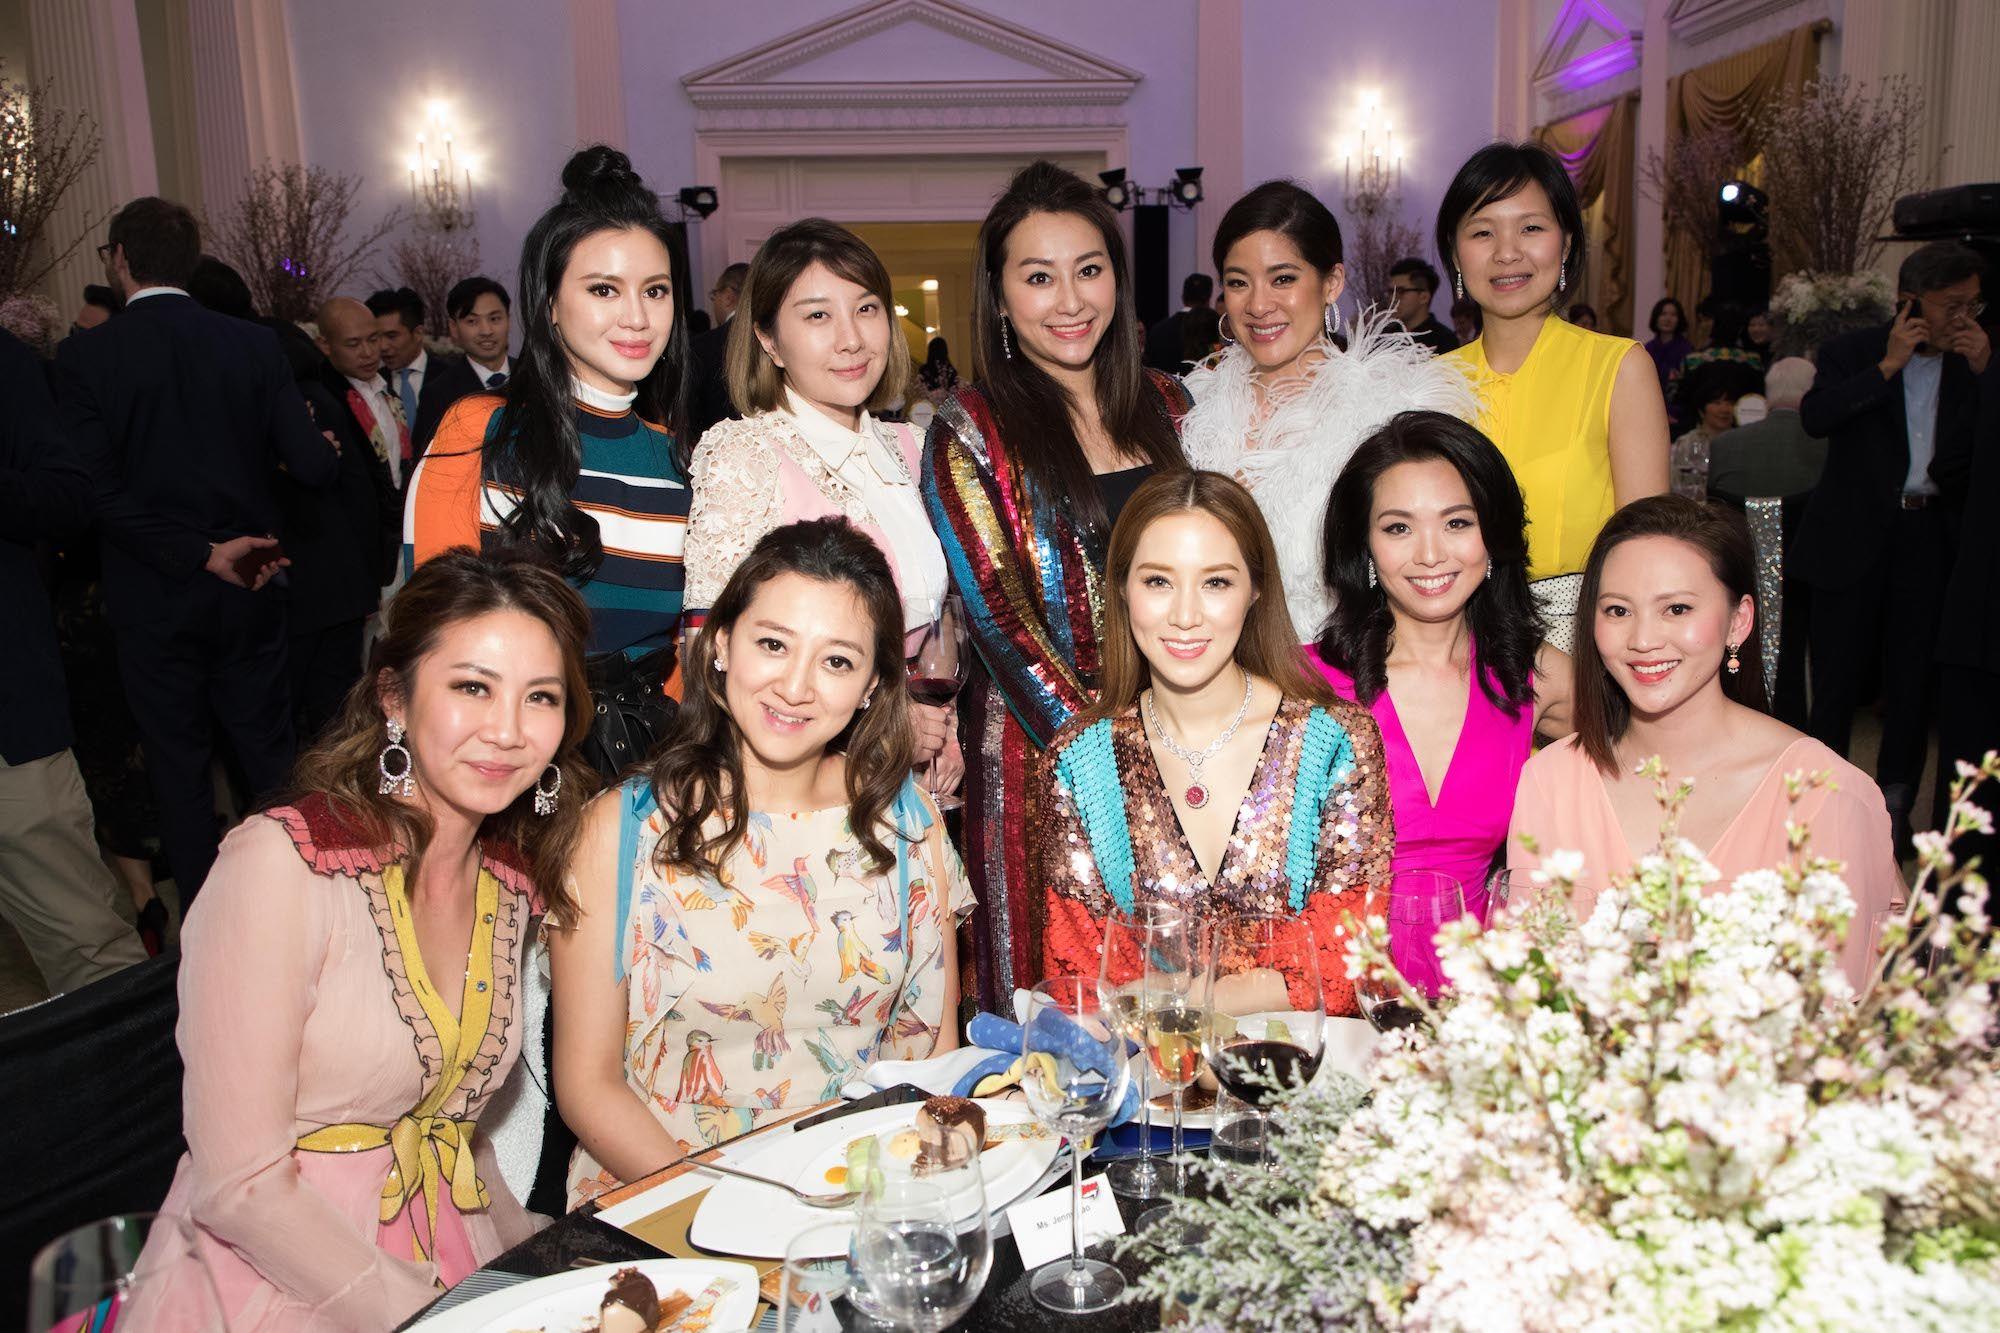 Standing - Emily Lam-Ho, Peggy Yeoh, Winnie Chiu, Sabrina Fung-Lam, Lili Ma. Seated - Adrienne Hui, Wendy Hui, Cathy Lee, Anne Wang-Liu, Ling Li